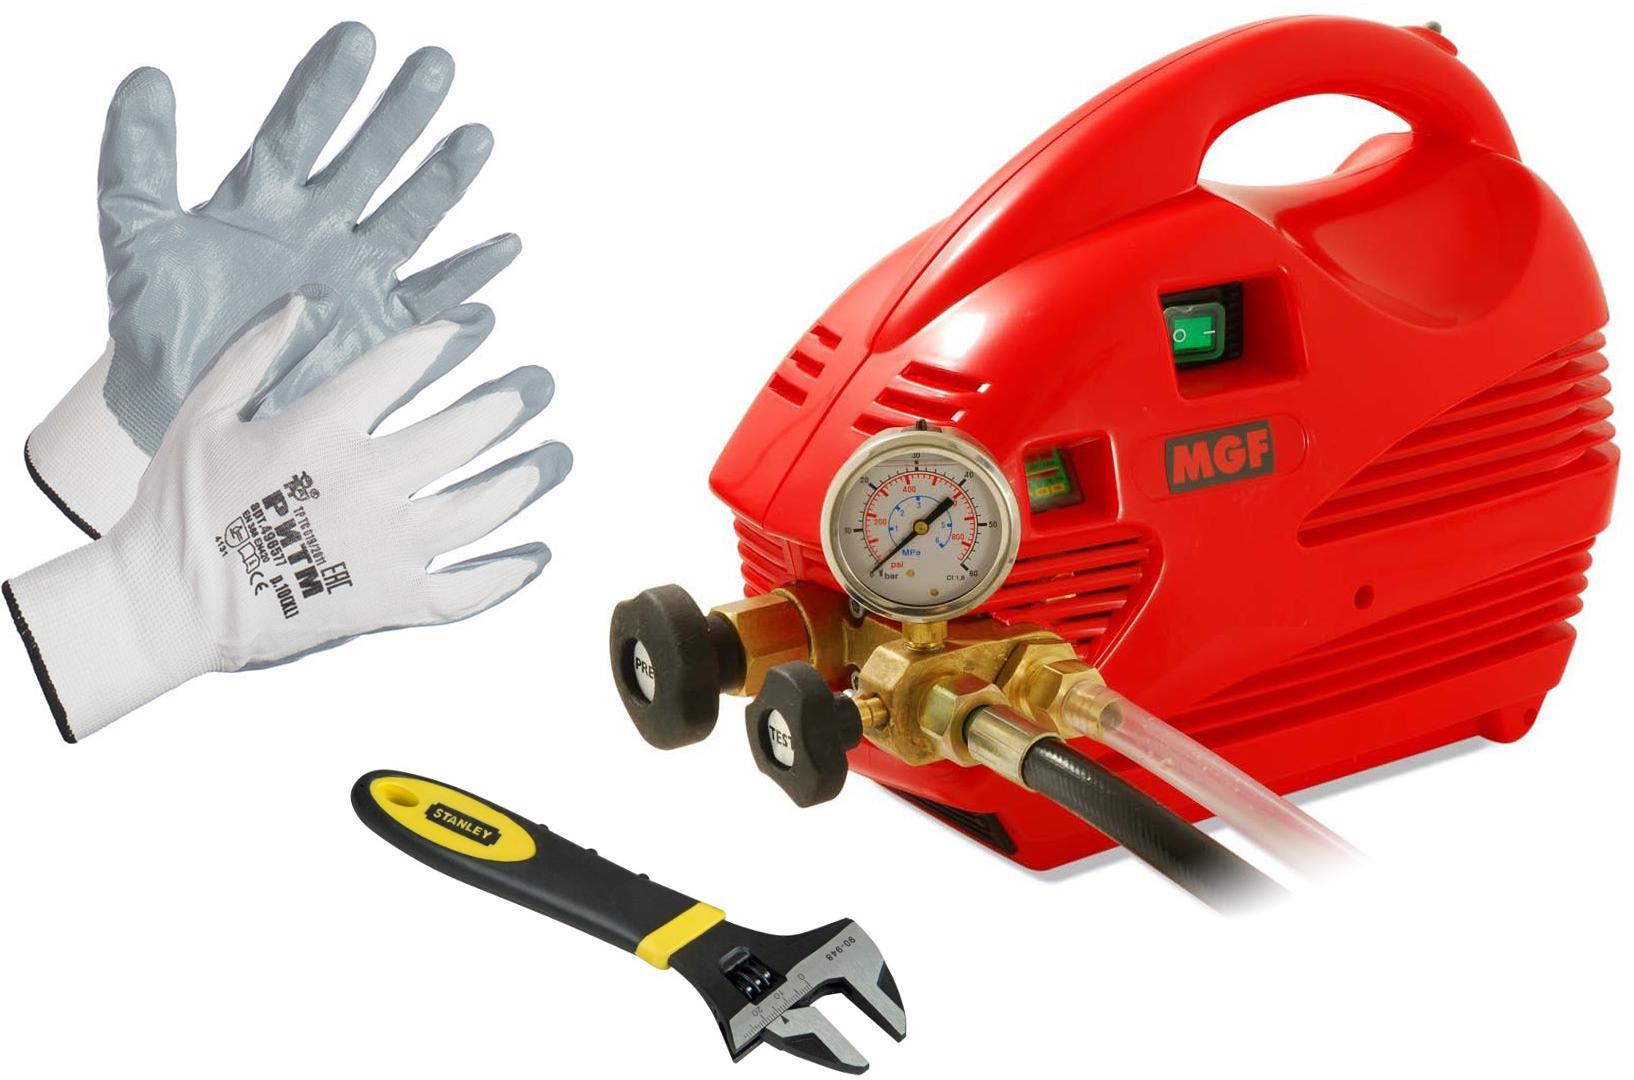 Набор Mgf Опрессовщик compact 60 905200 +Ключ maxsteel 0-90-948 (0 - 24 мм) +Перчатки 496577